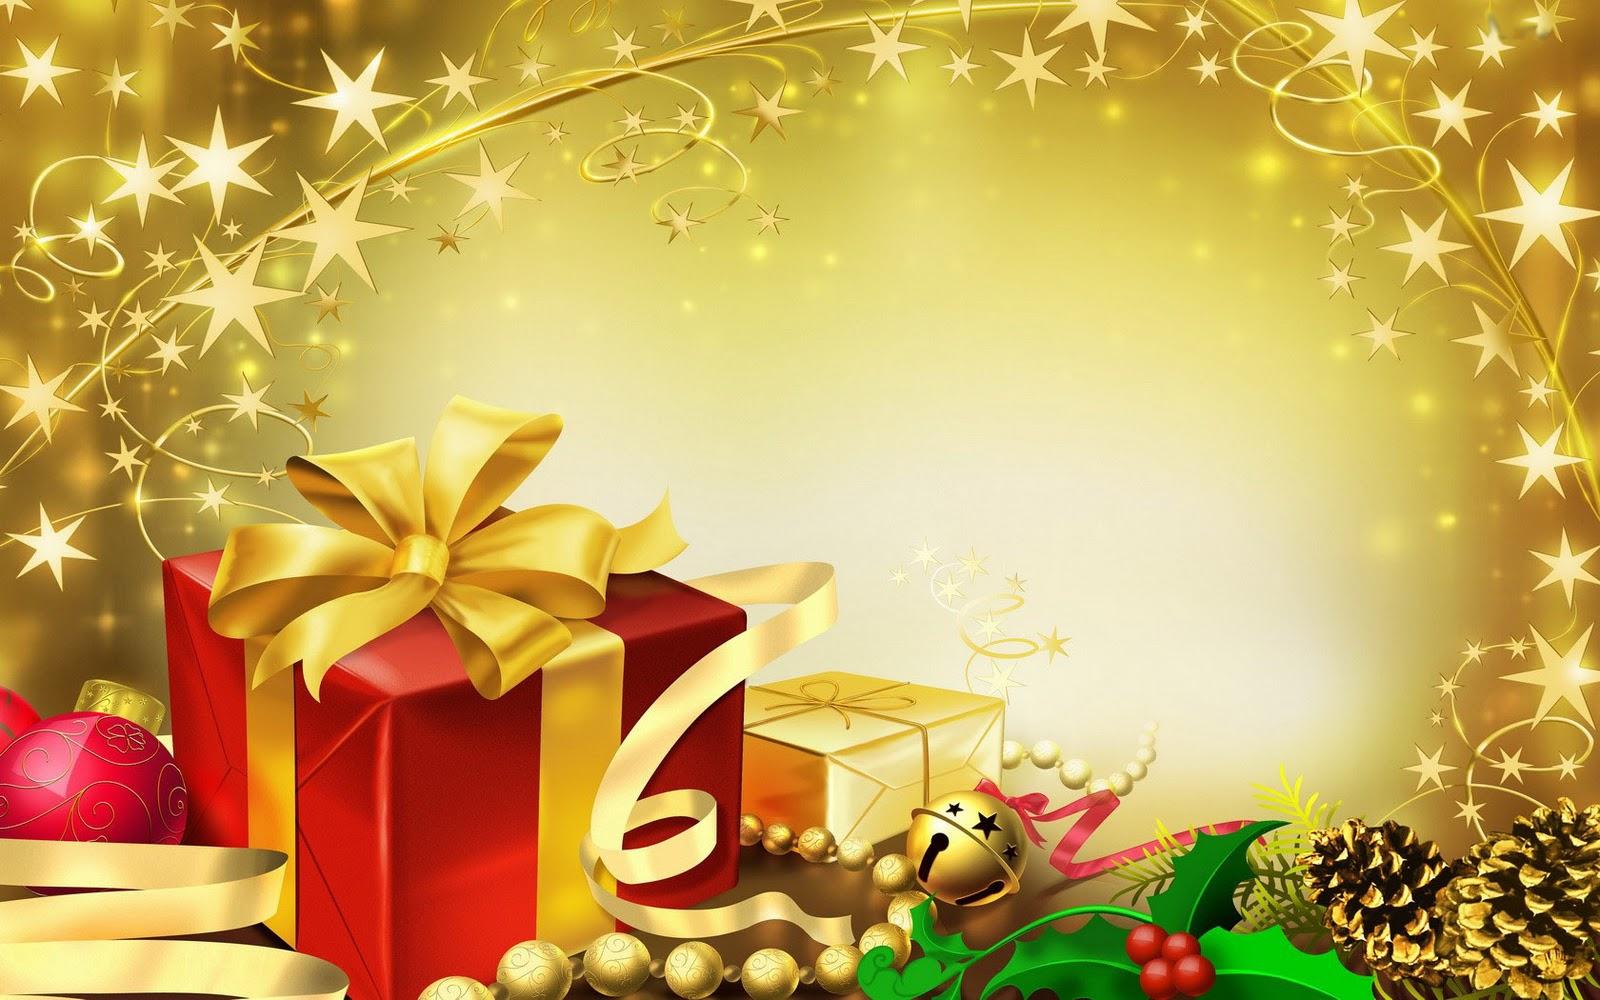 Free Wallpaper - Arta cafelei: Christmas Wallpaper